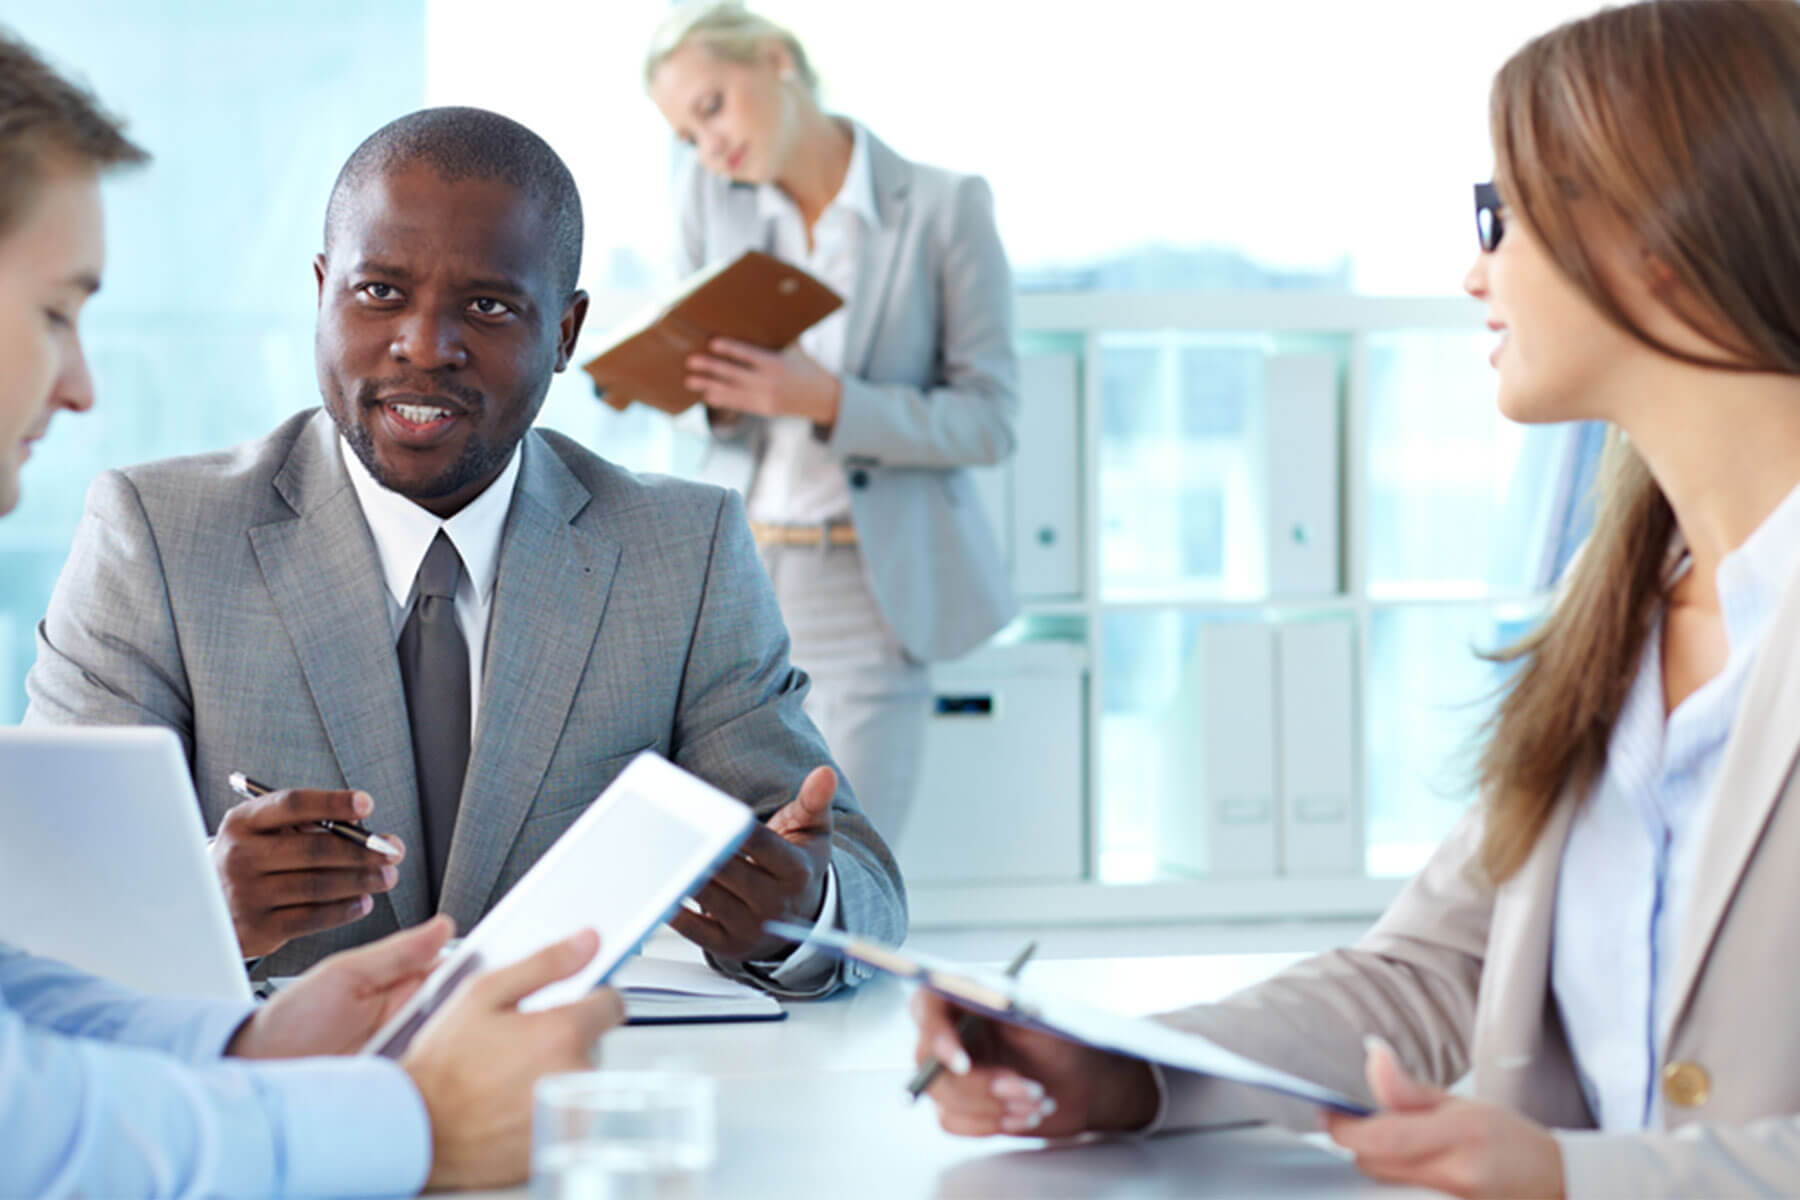 Global Accounting Network: BRANDING